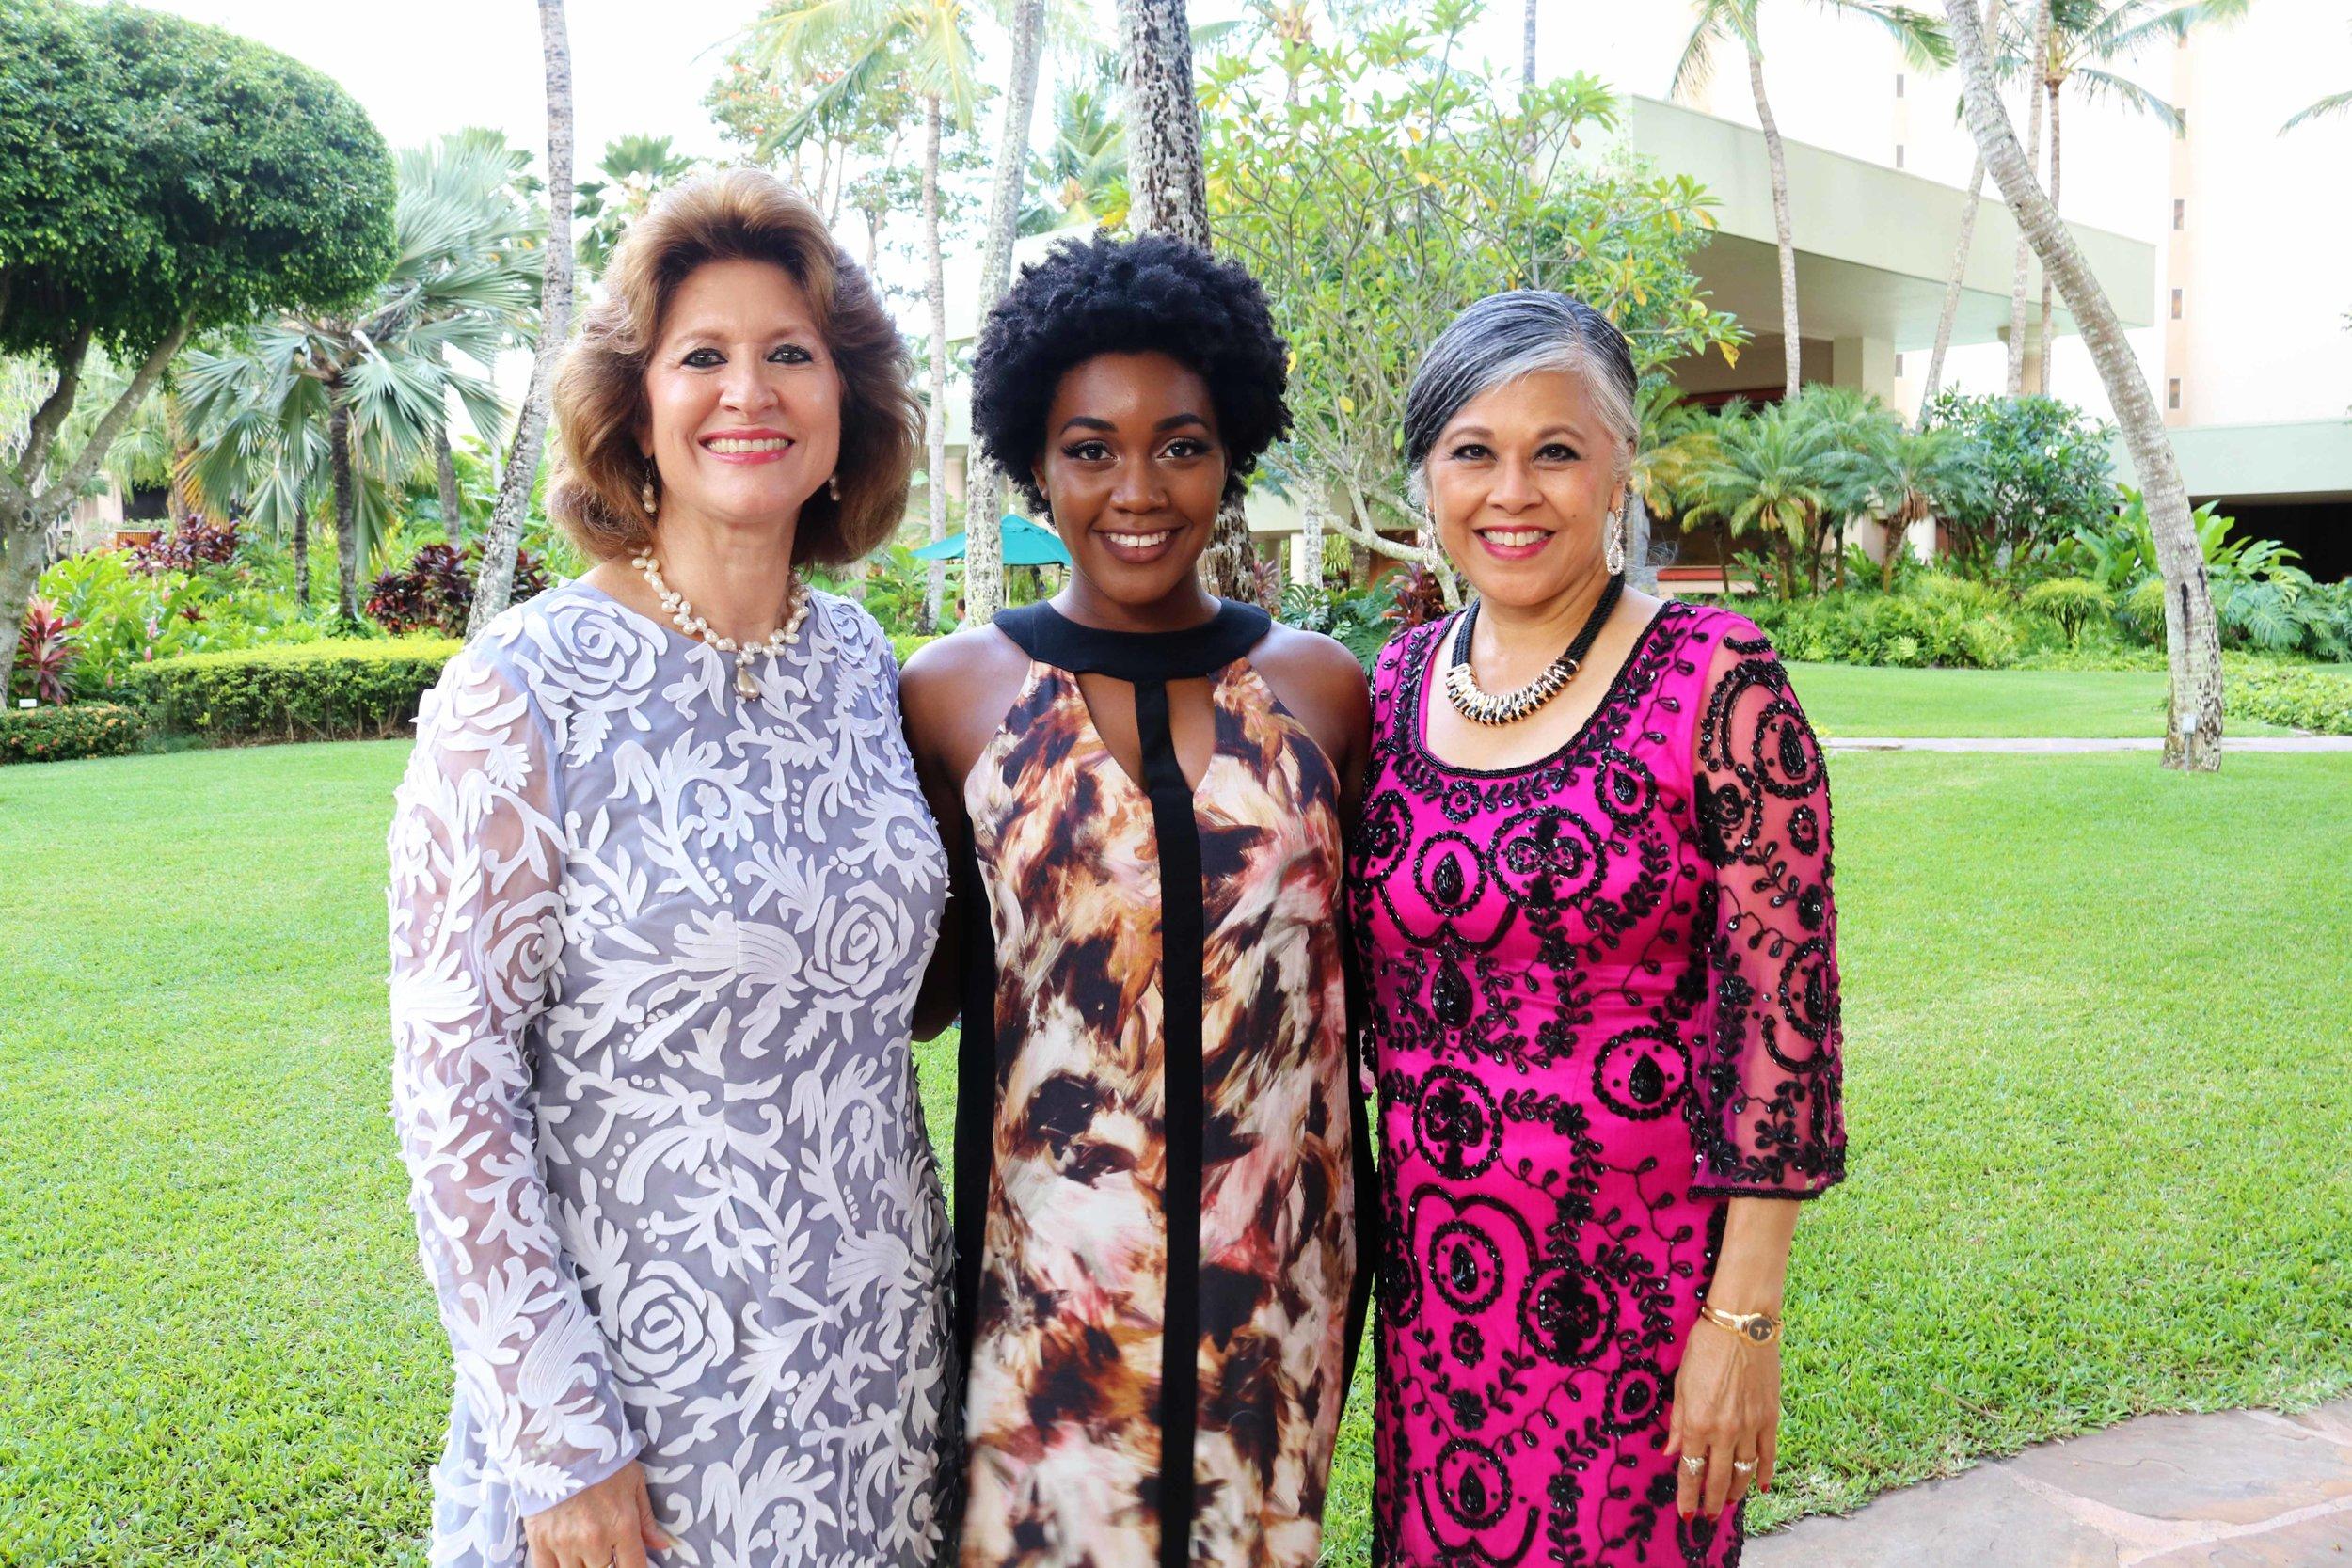 Prior to the show with Sue Kanoho, Executive Director of the Kauai Visitors Bureau